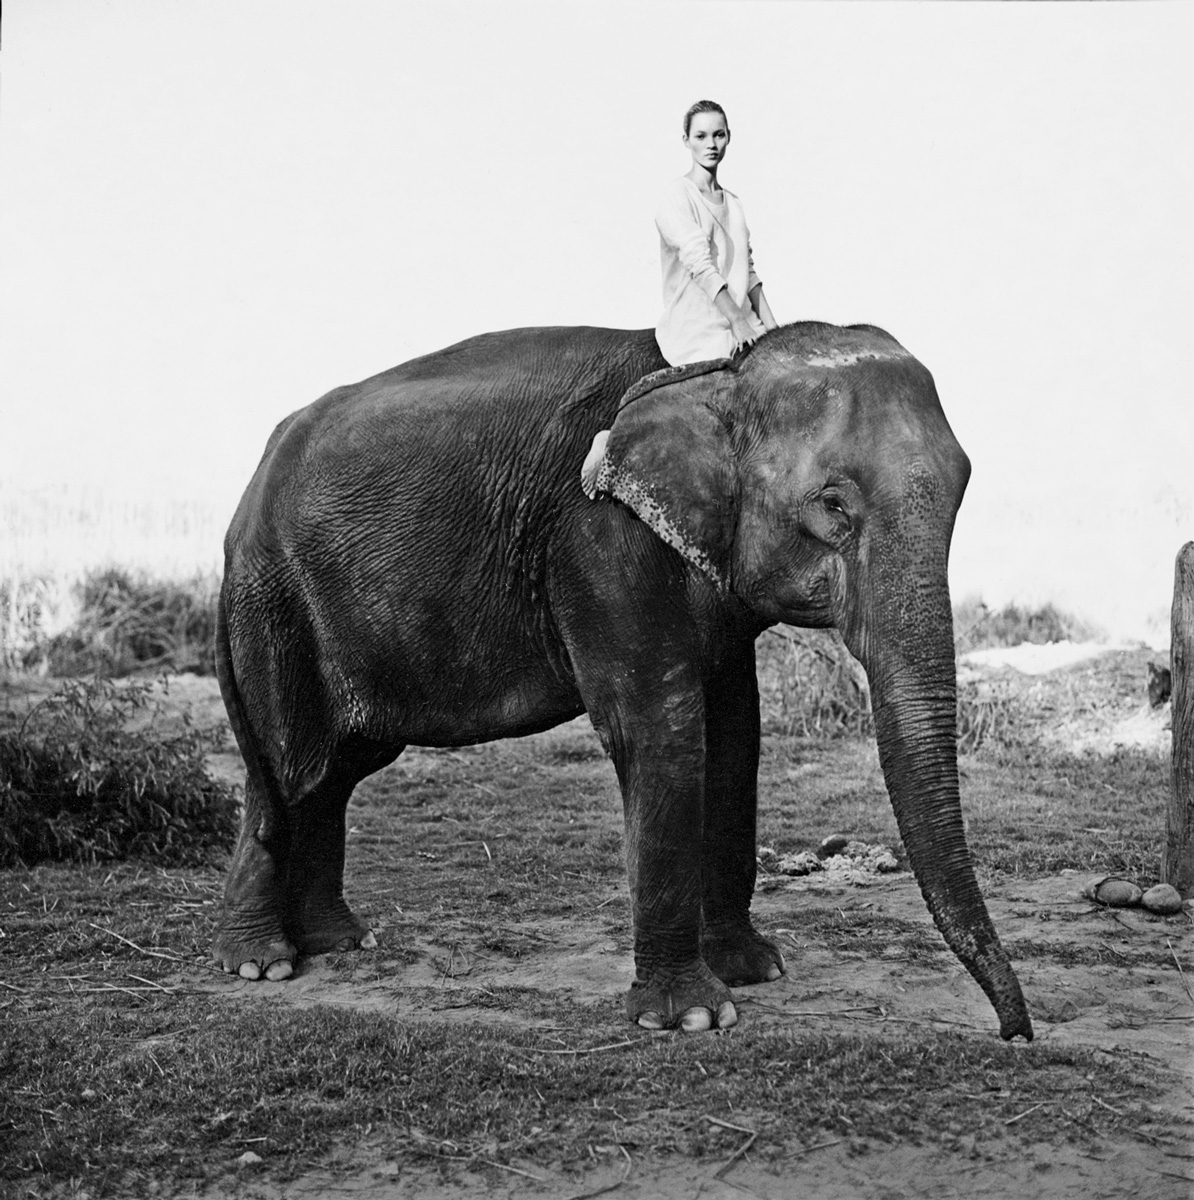 Kate Moss on the Elephant, British